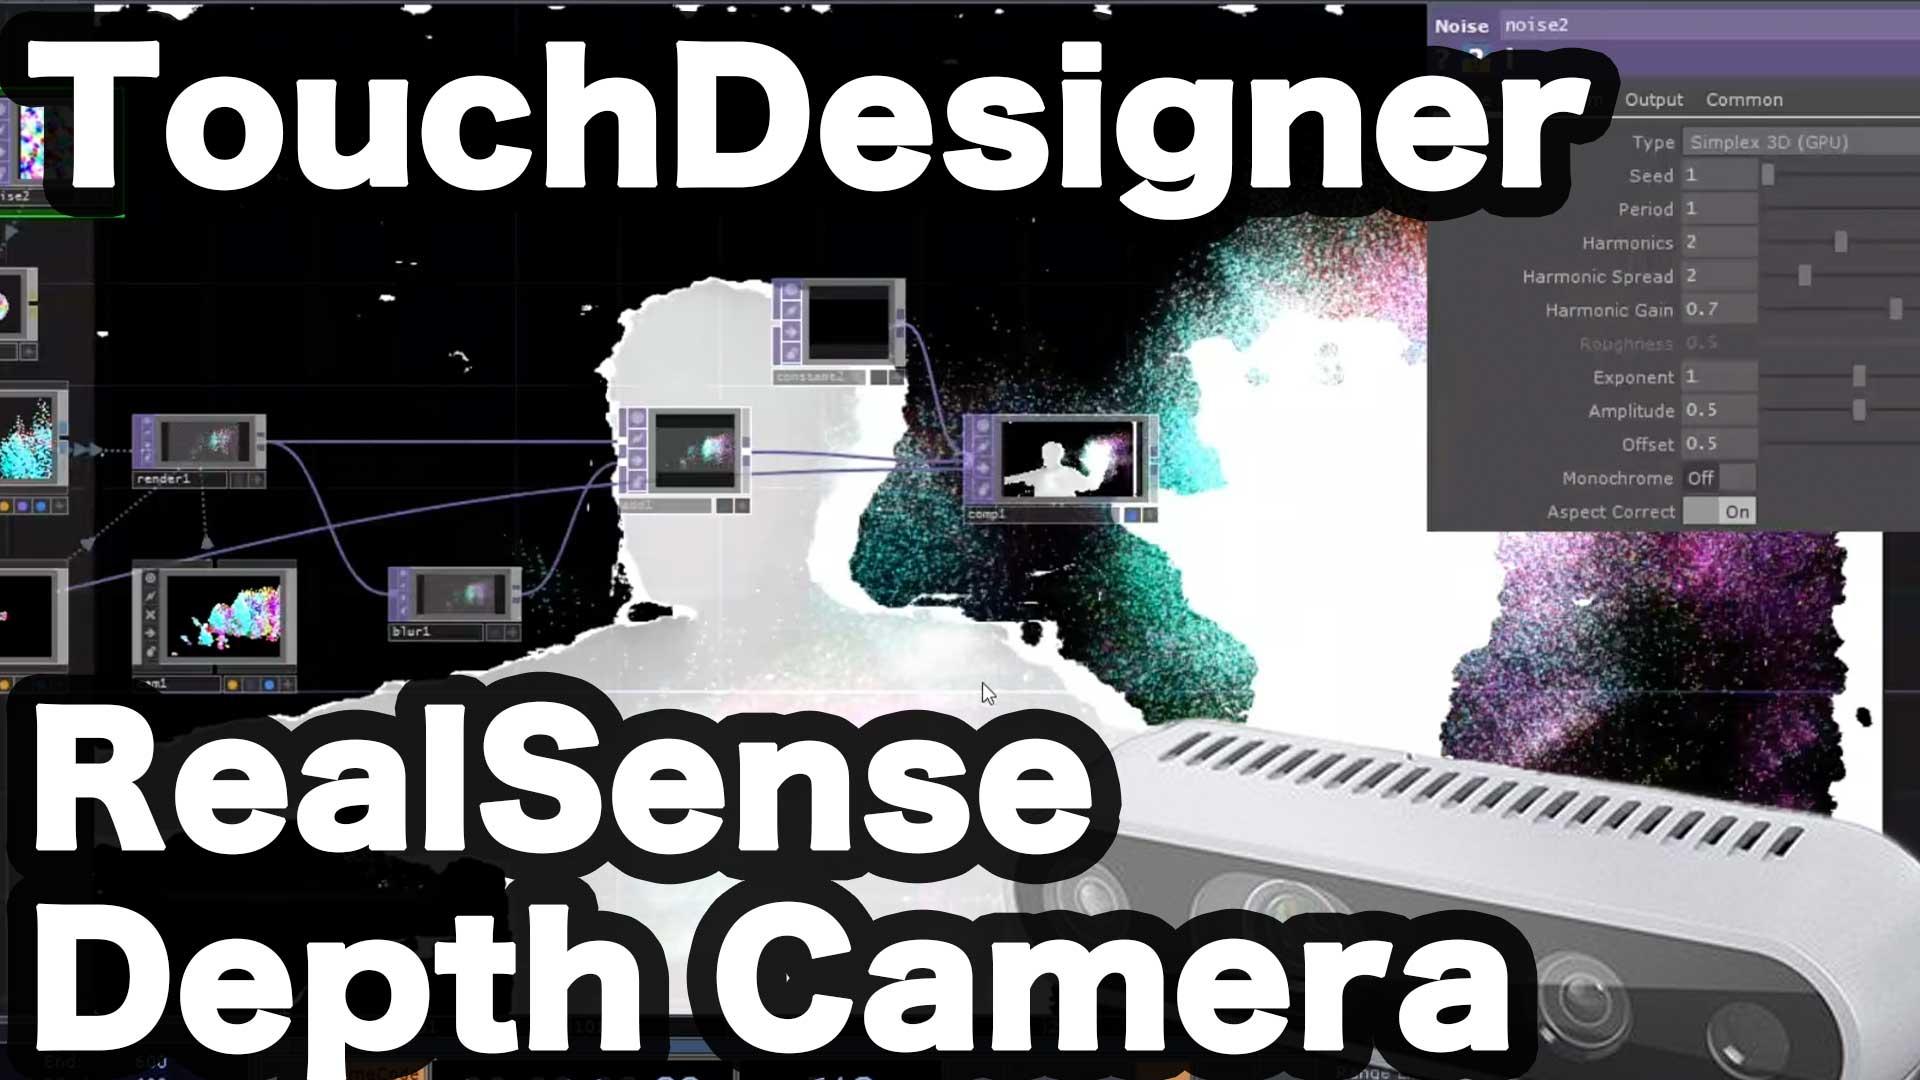 RealSenseCamera